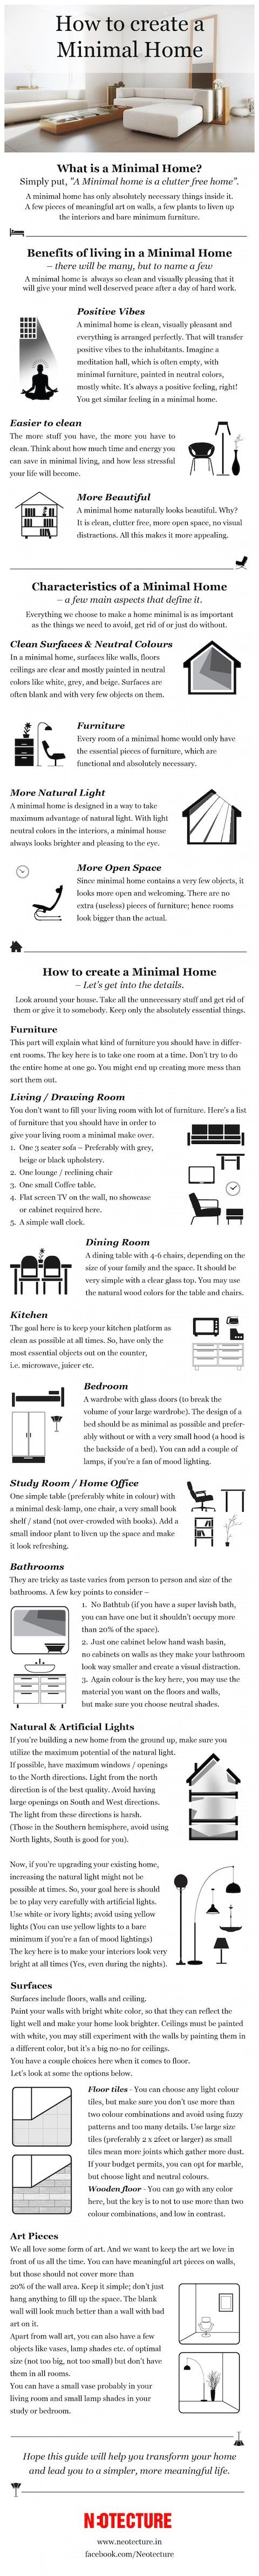 How to create a minimal home